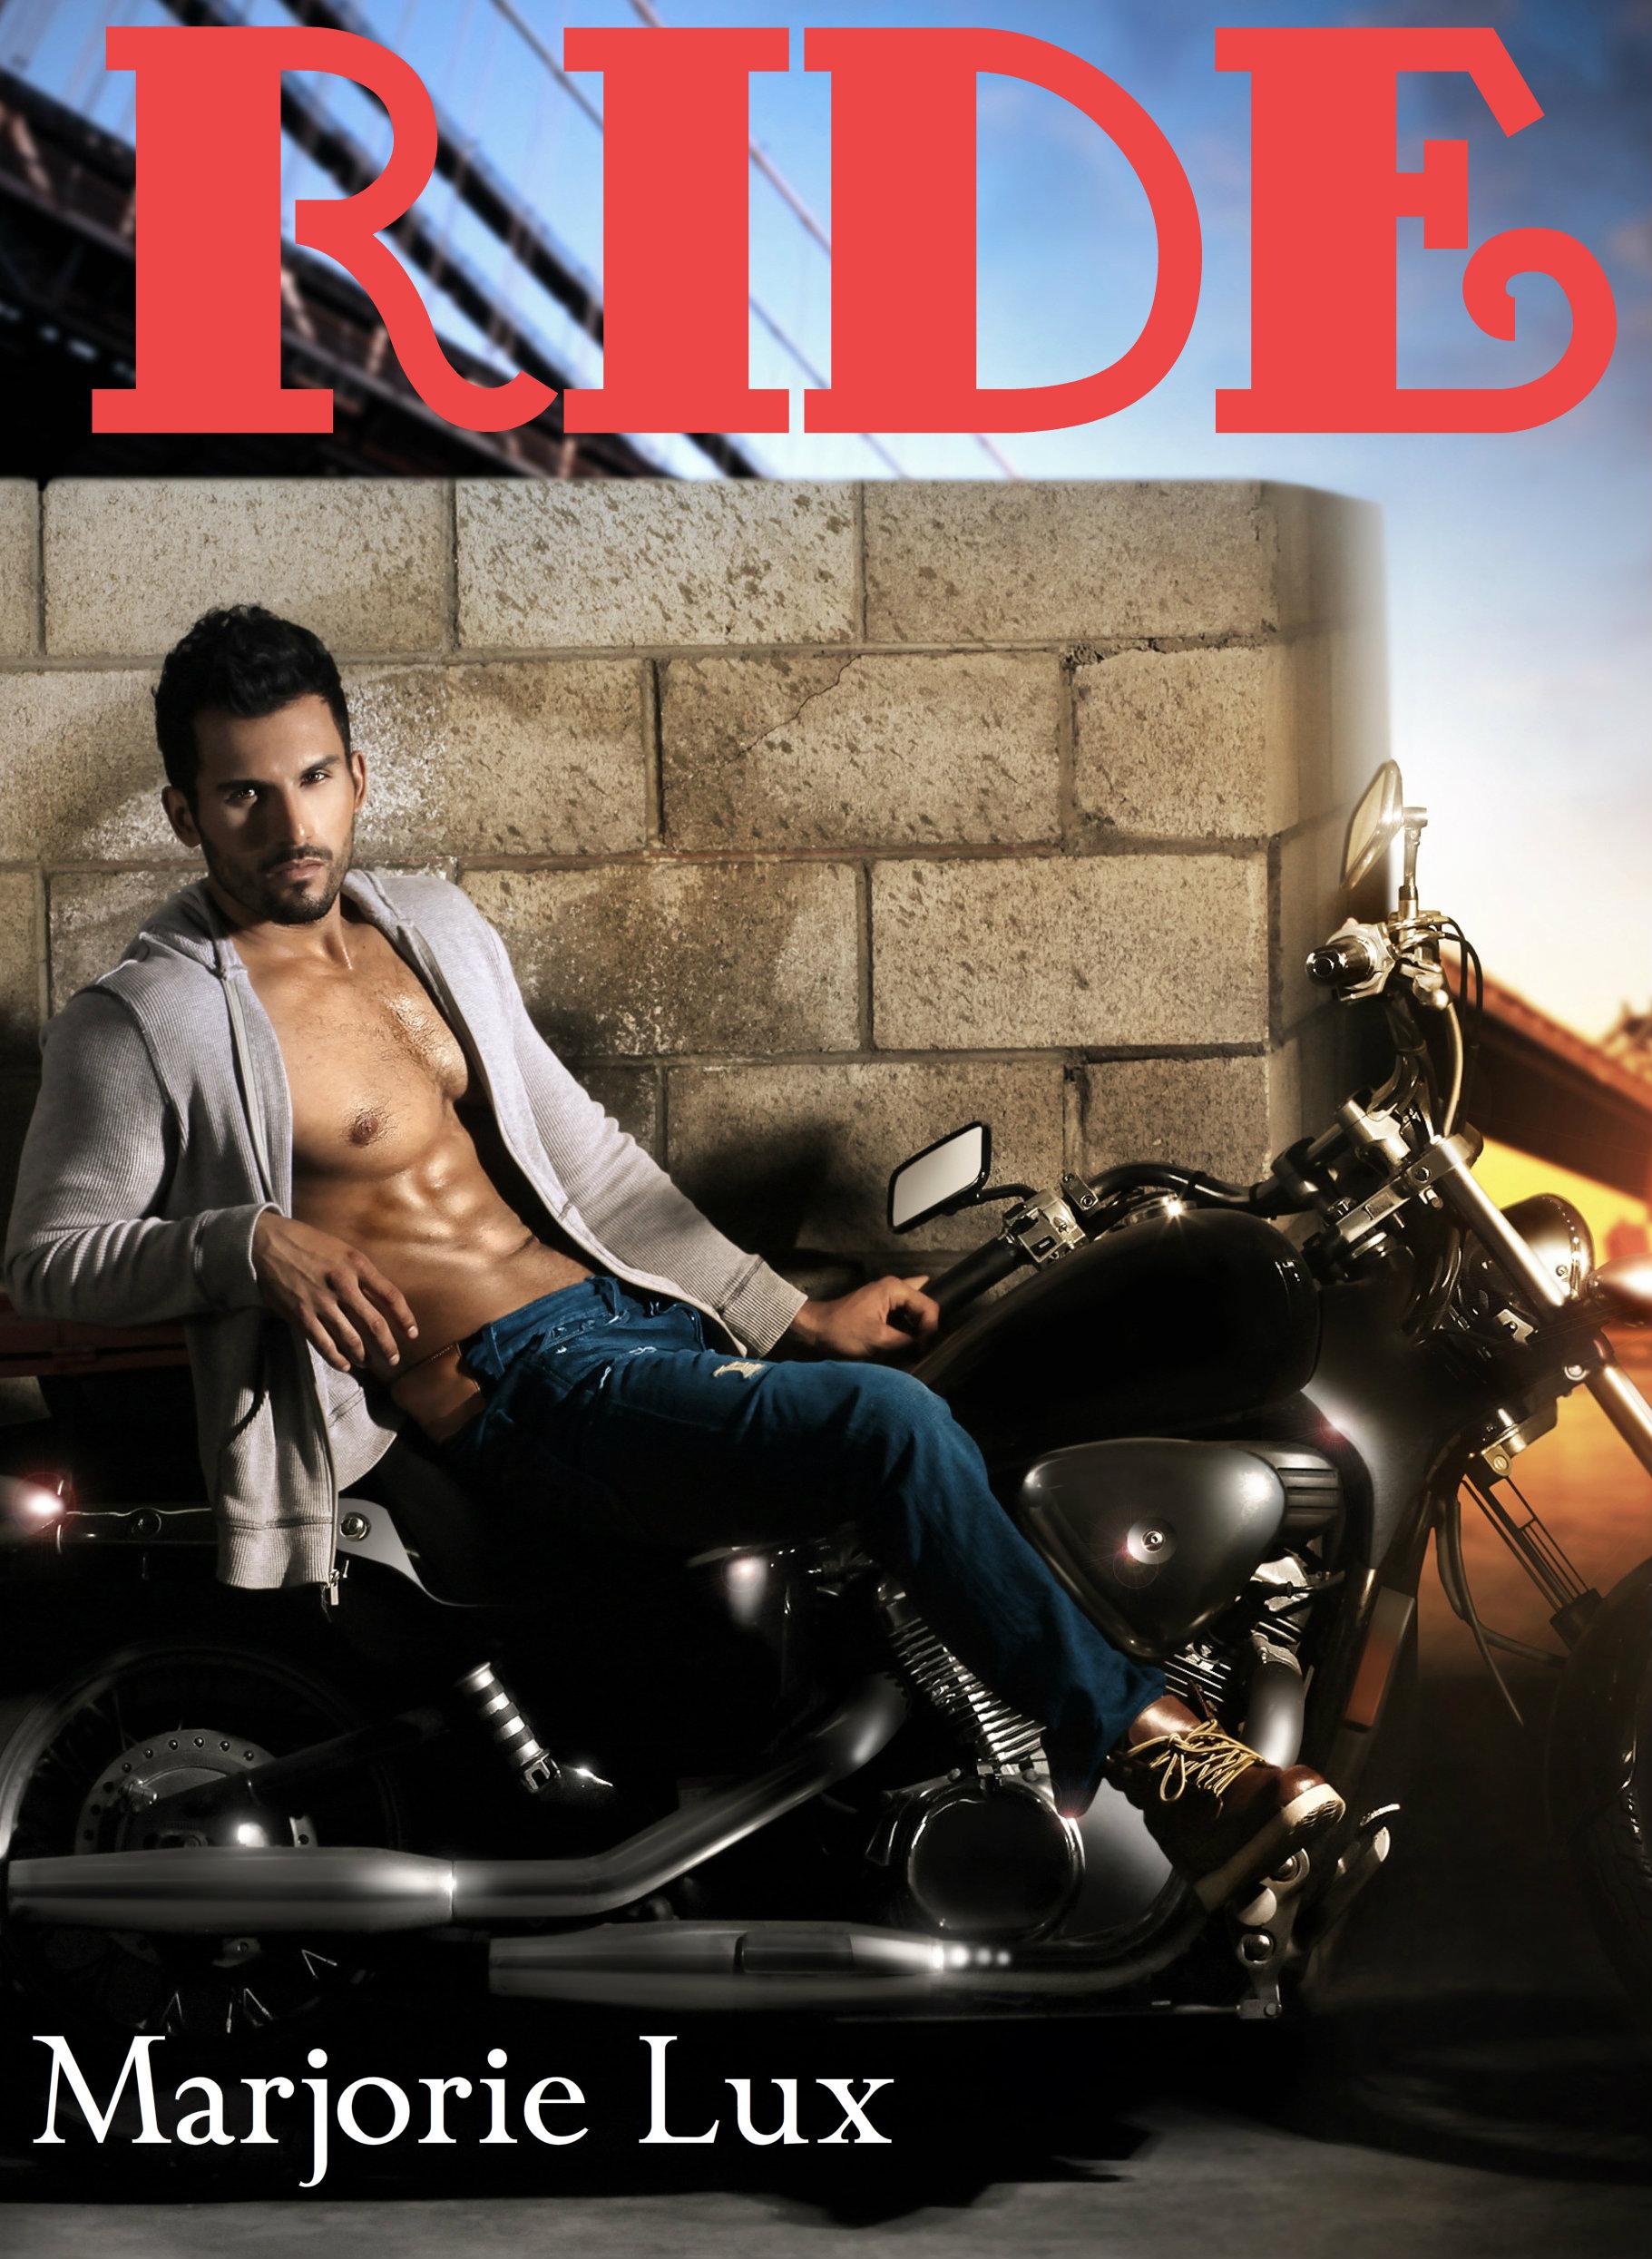 Marjorie Lux - Ride (Erotic Motorcycle Club Romance)